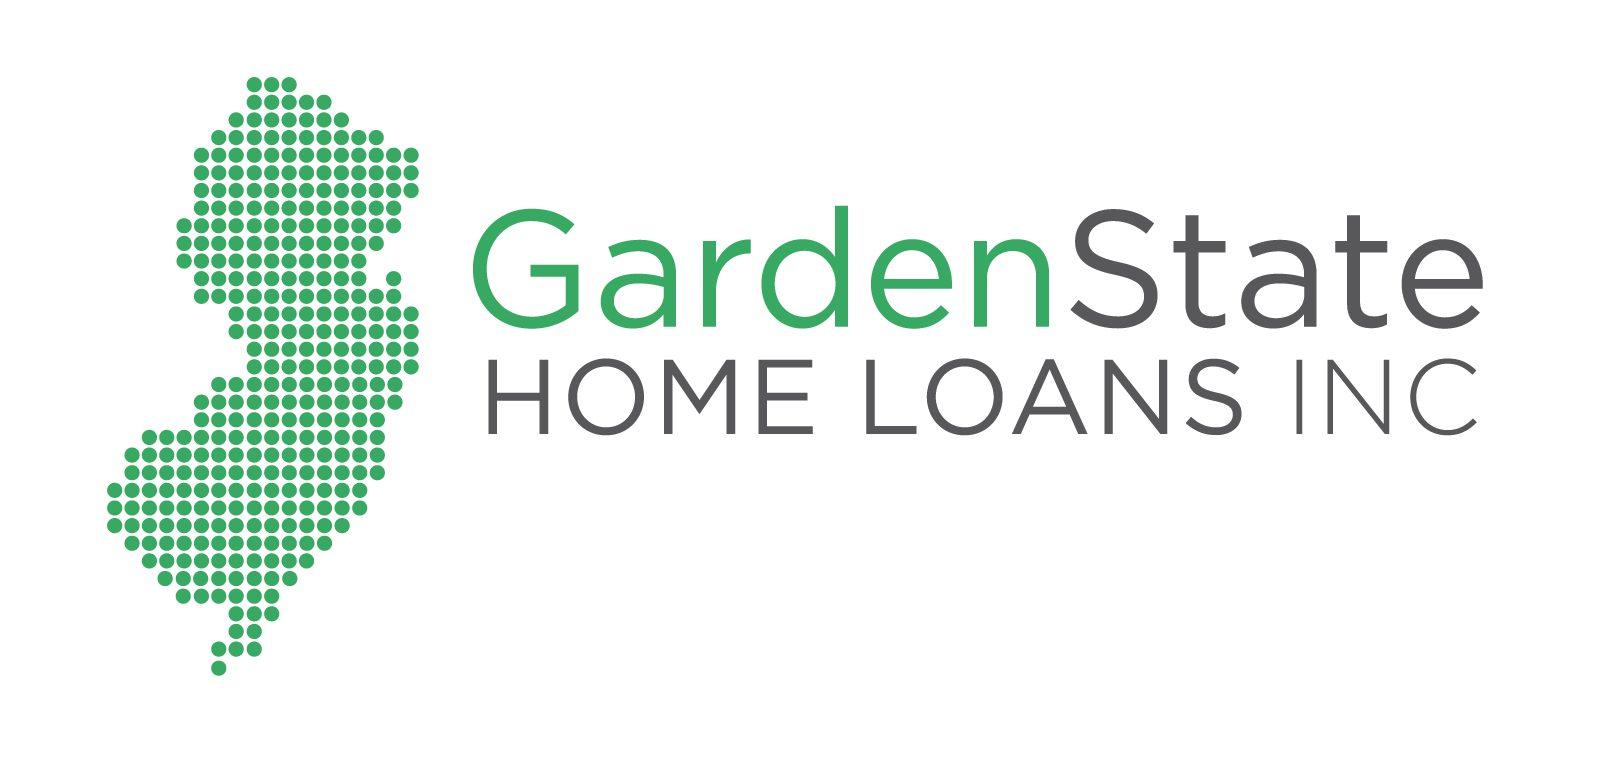 garden state home loans - Garden State Home Loans